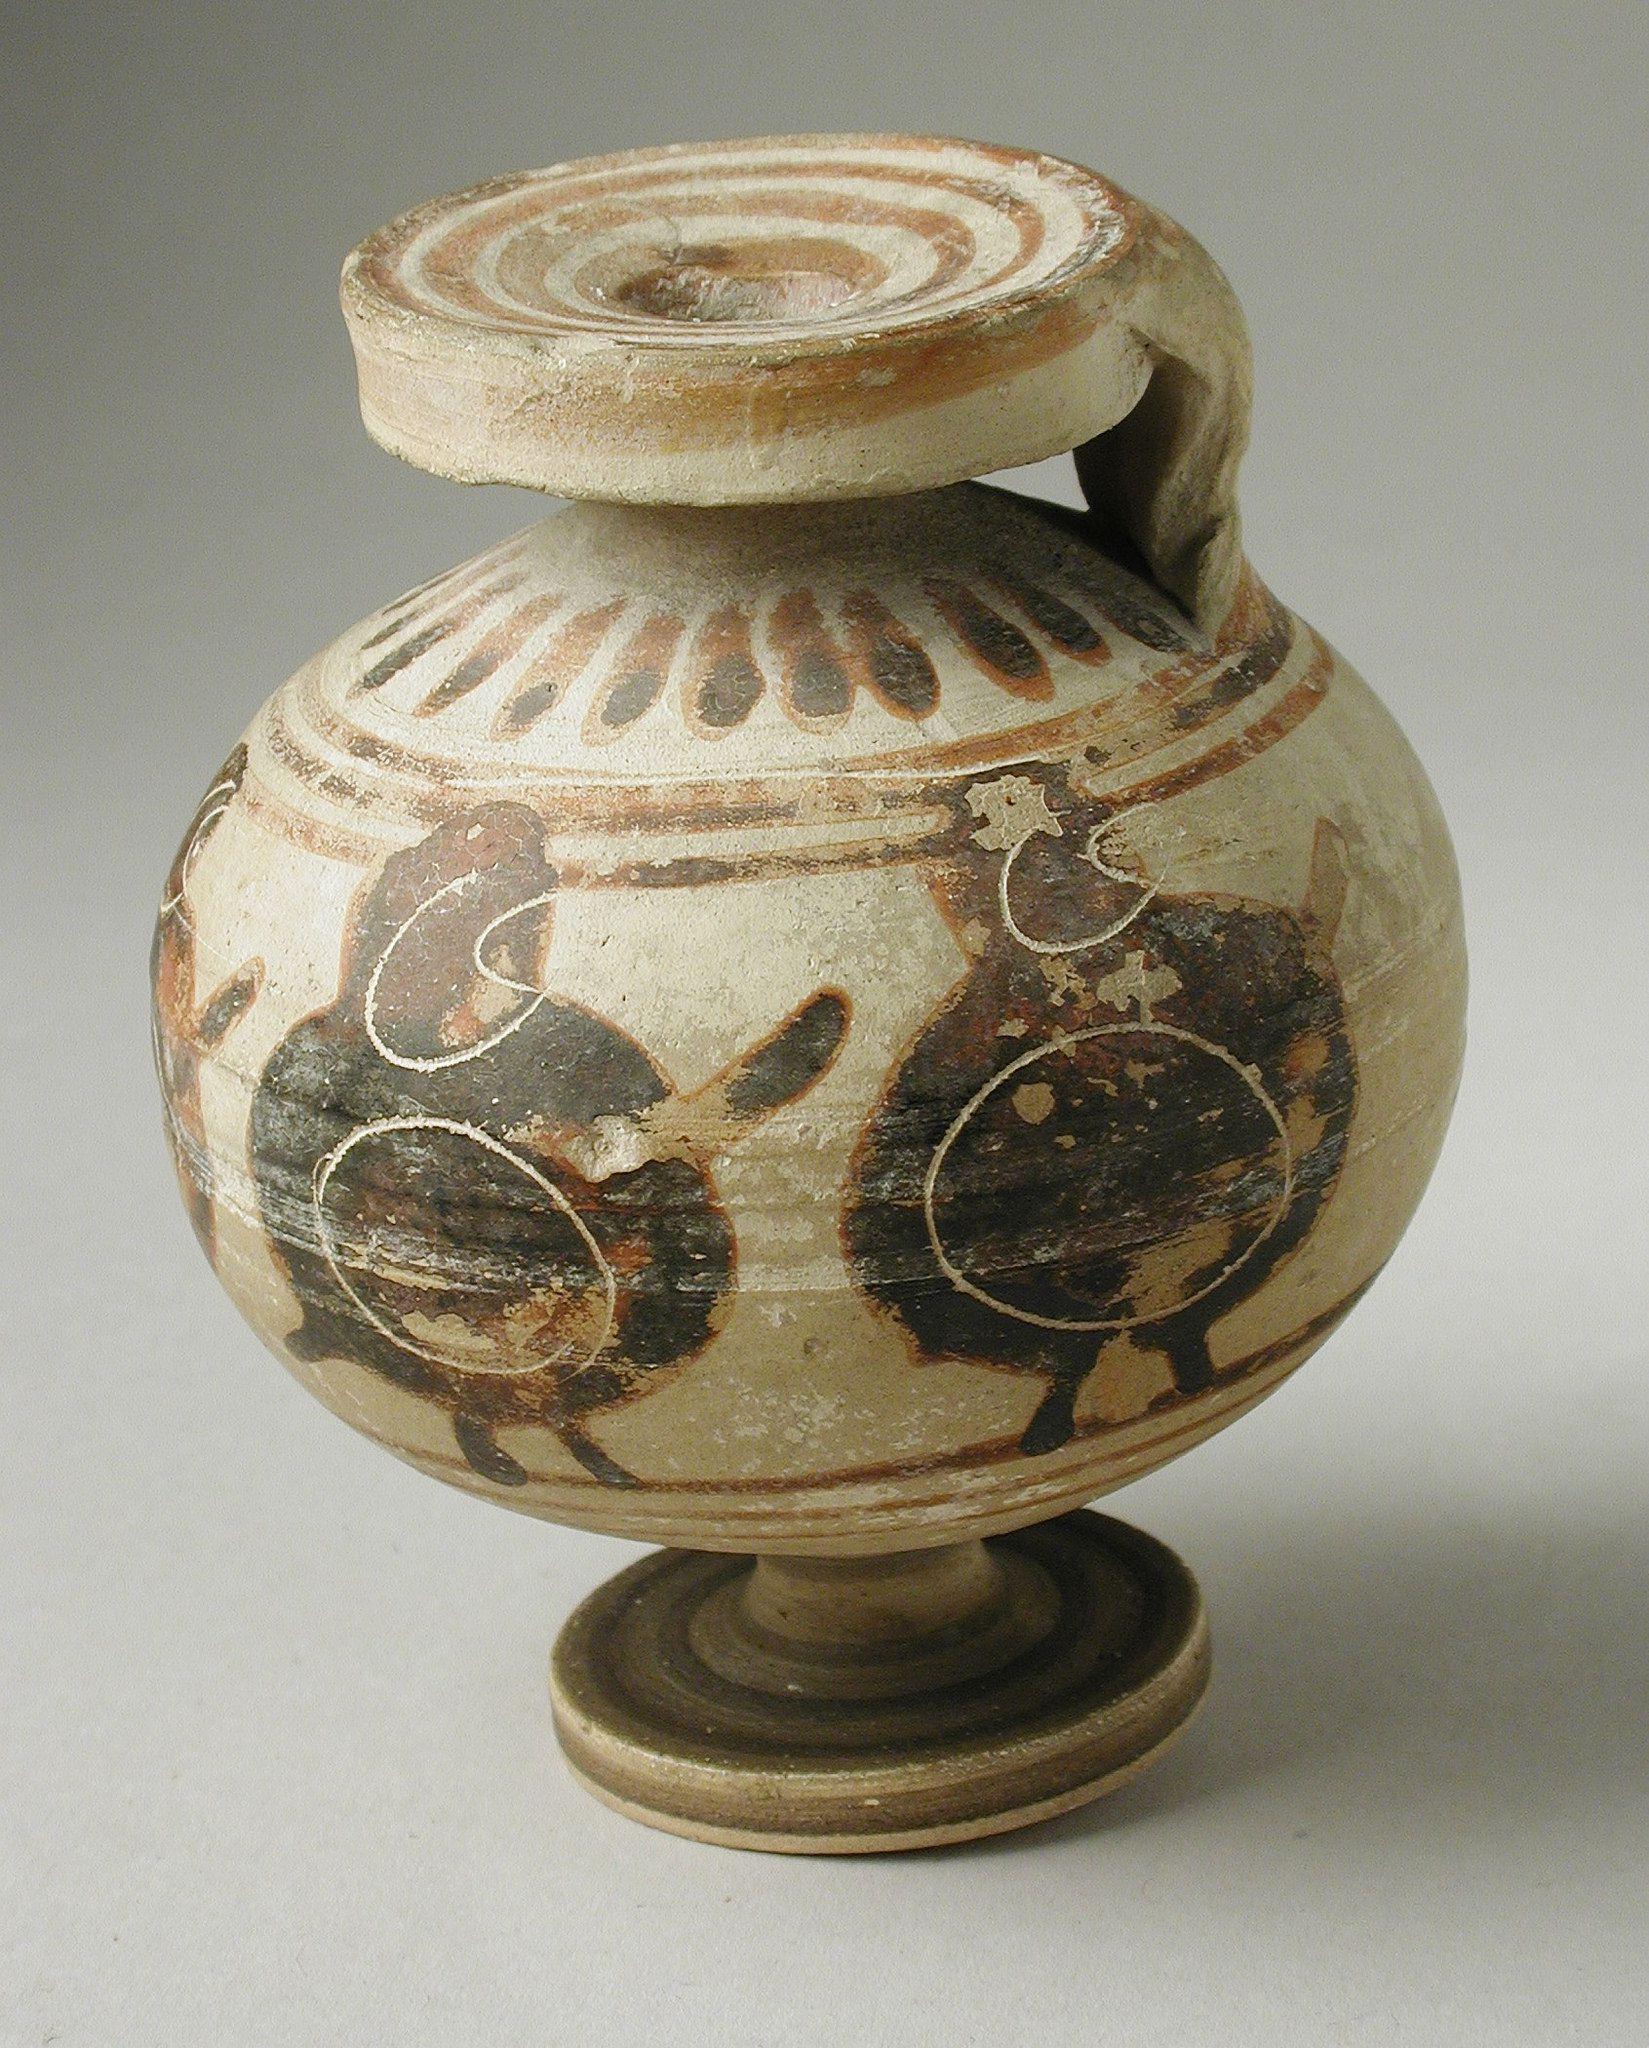 athenian black figure vases of periods of ancient greek pottery types of vases regarding 16395392172 e853f2d11b k 589fa7123df78c4758a422ff